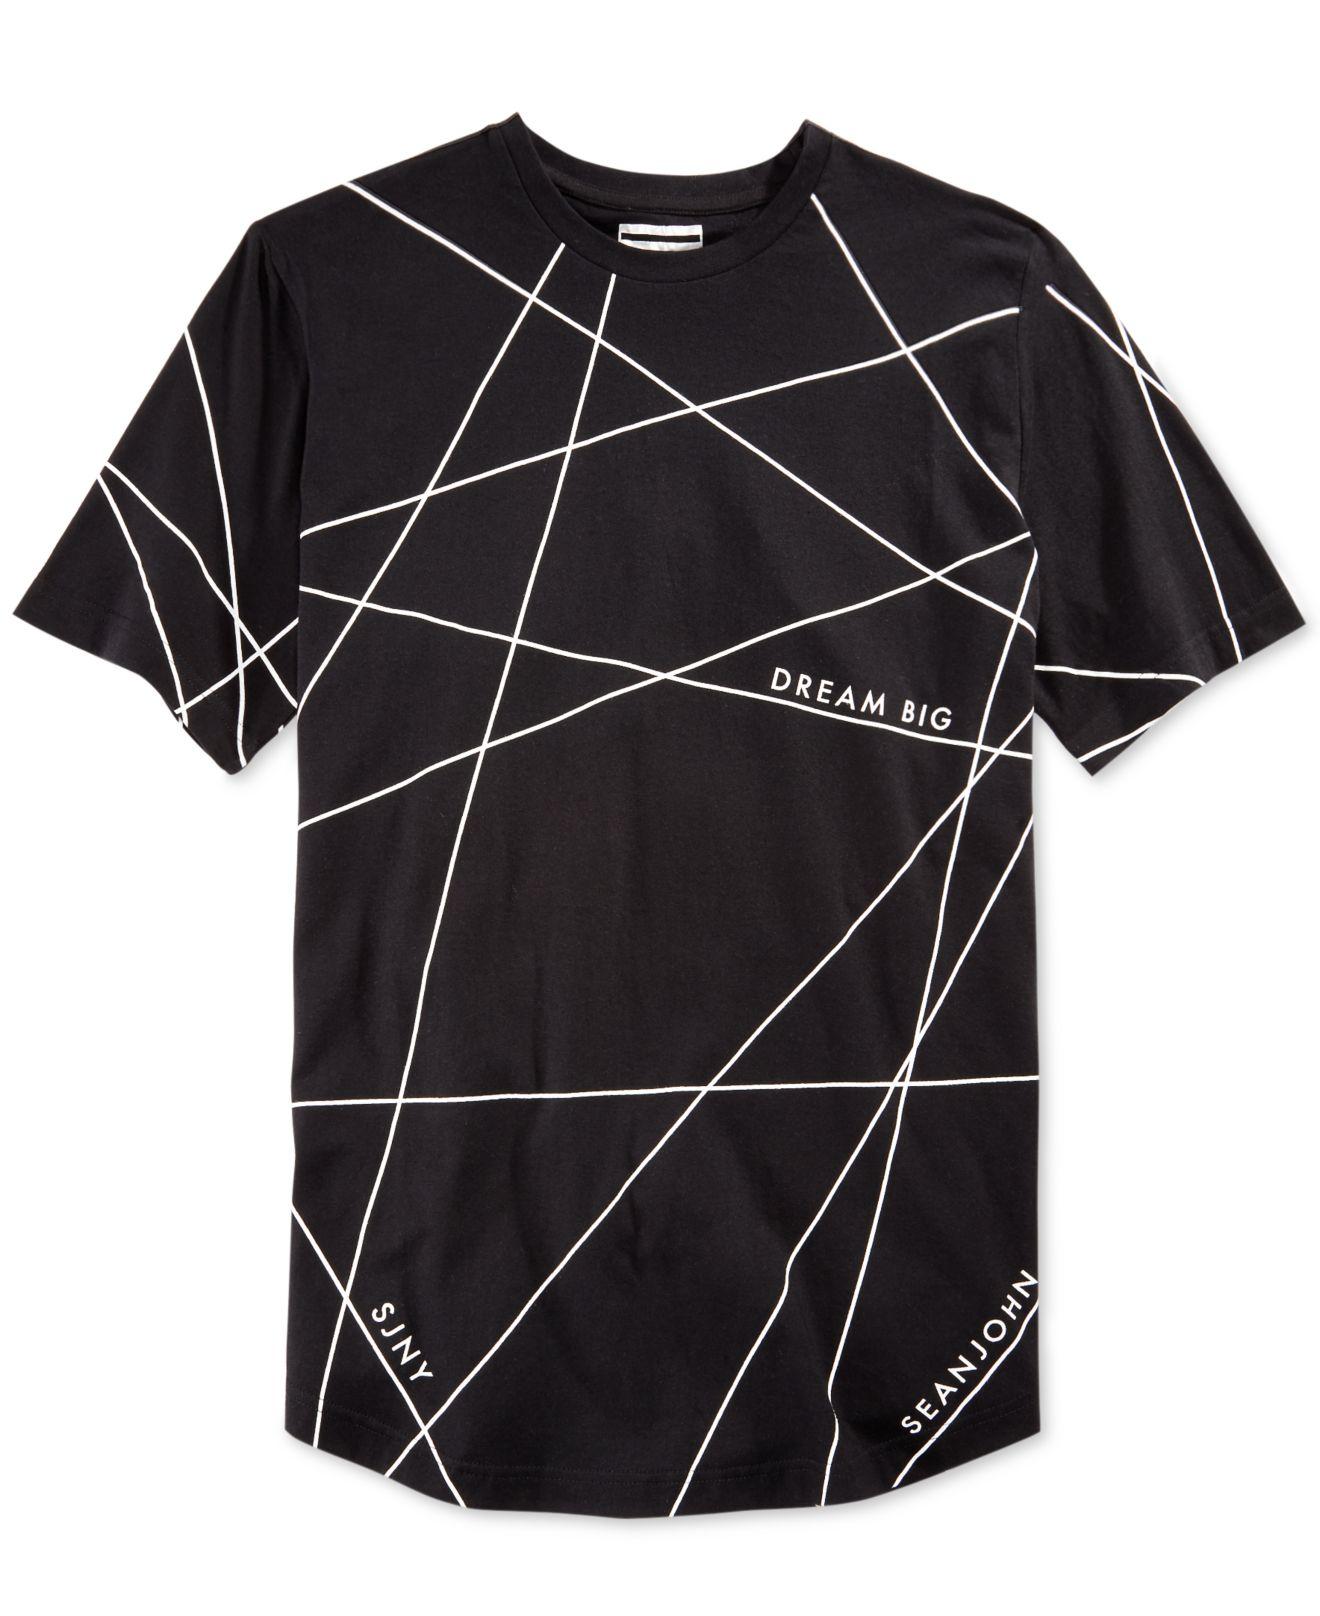 Lyst sean john men 39 s big tall graphic print t shirt in for Sean john t shirts for mens